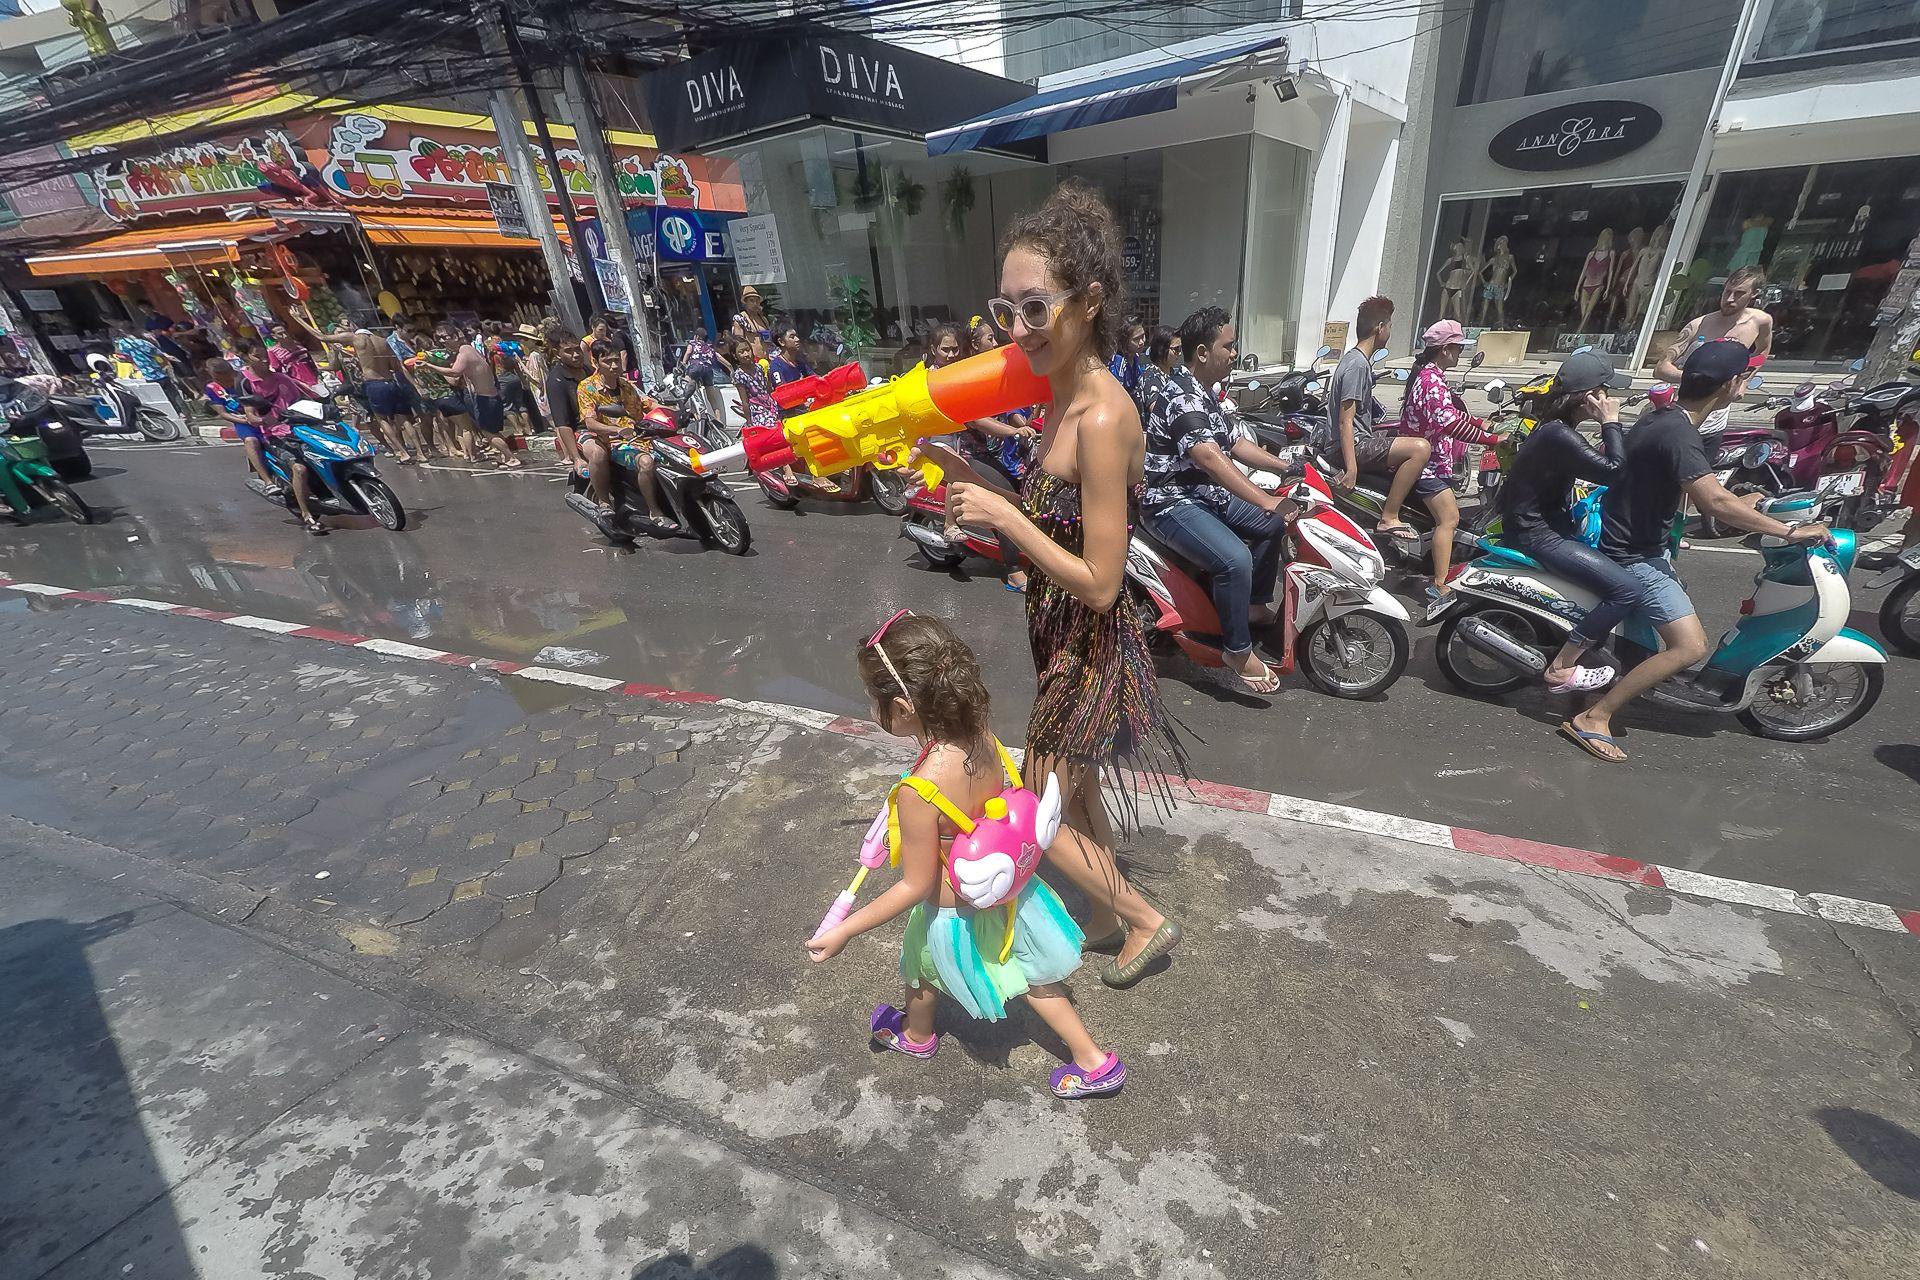 Самуи, Таиланд, сонгкран, сонкран, тайский новый год, водная битва, водяной пистолет, веселье, songkran, Thai new year ,Thailand, Samui, water, water battle, water gun, happy new year